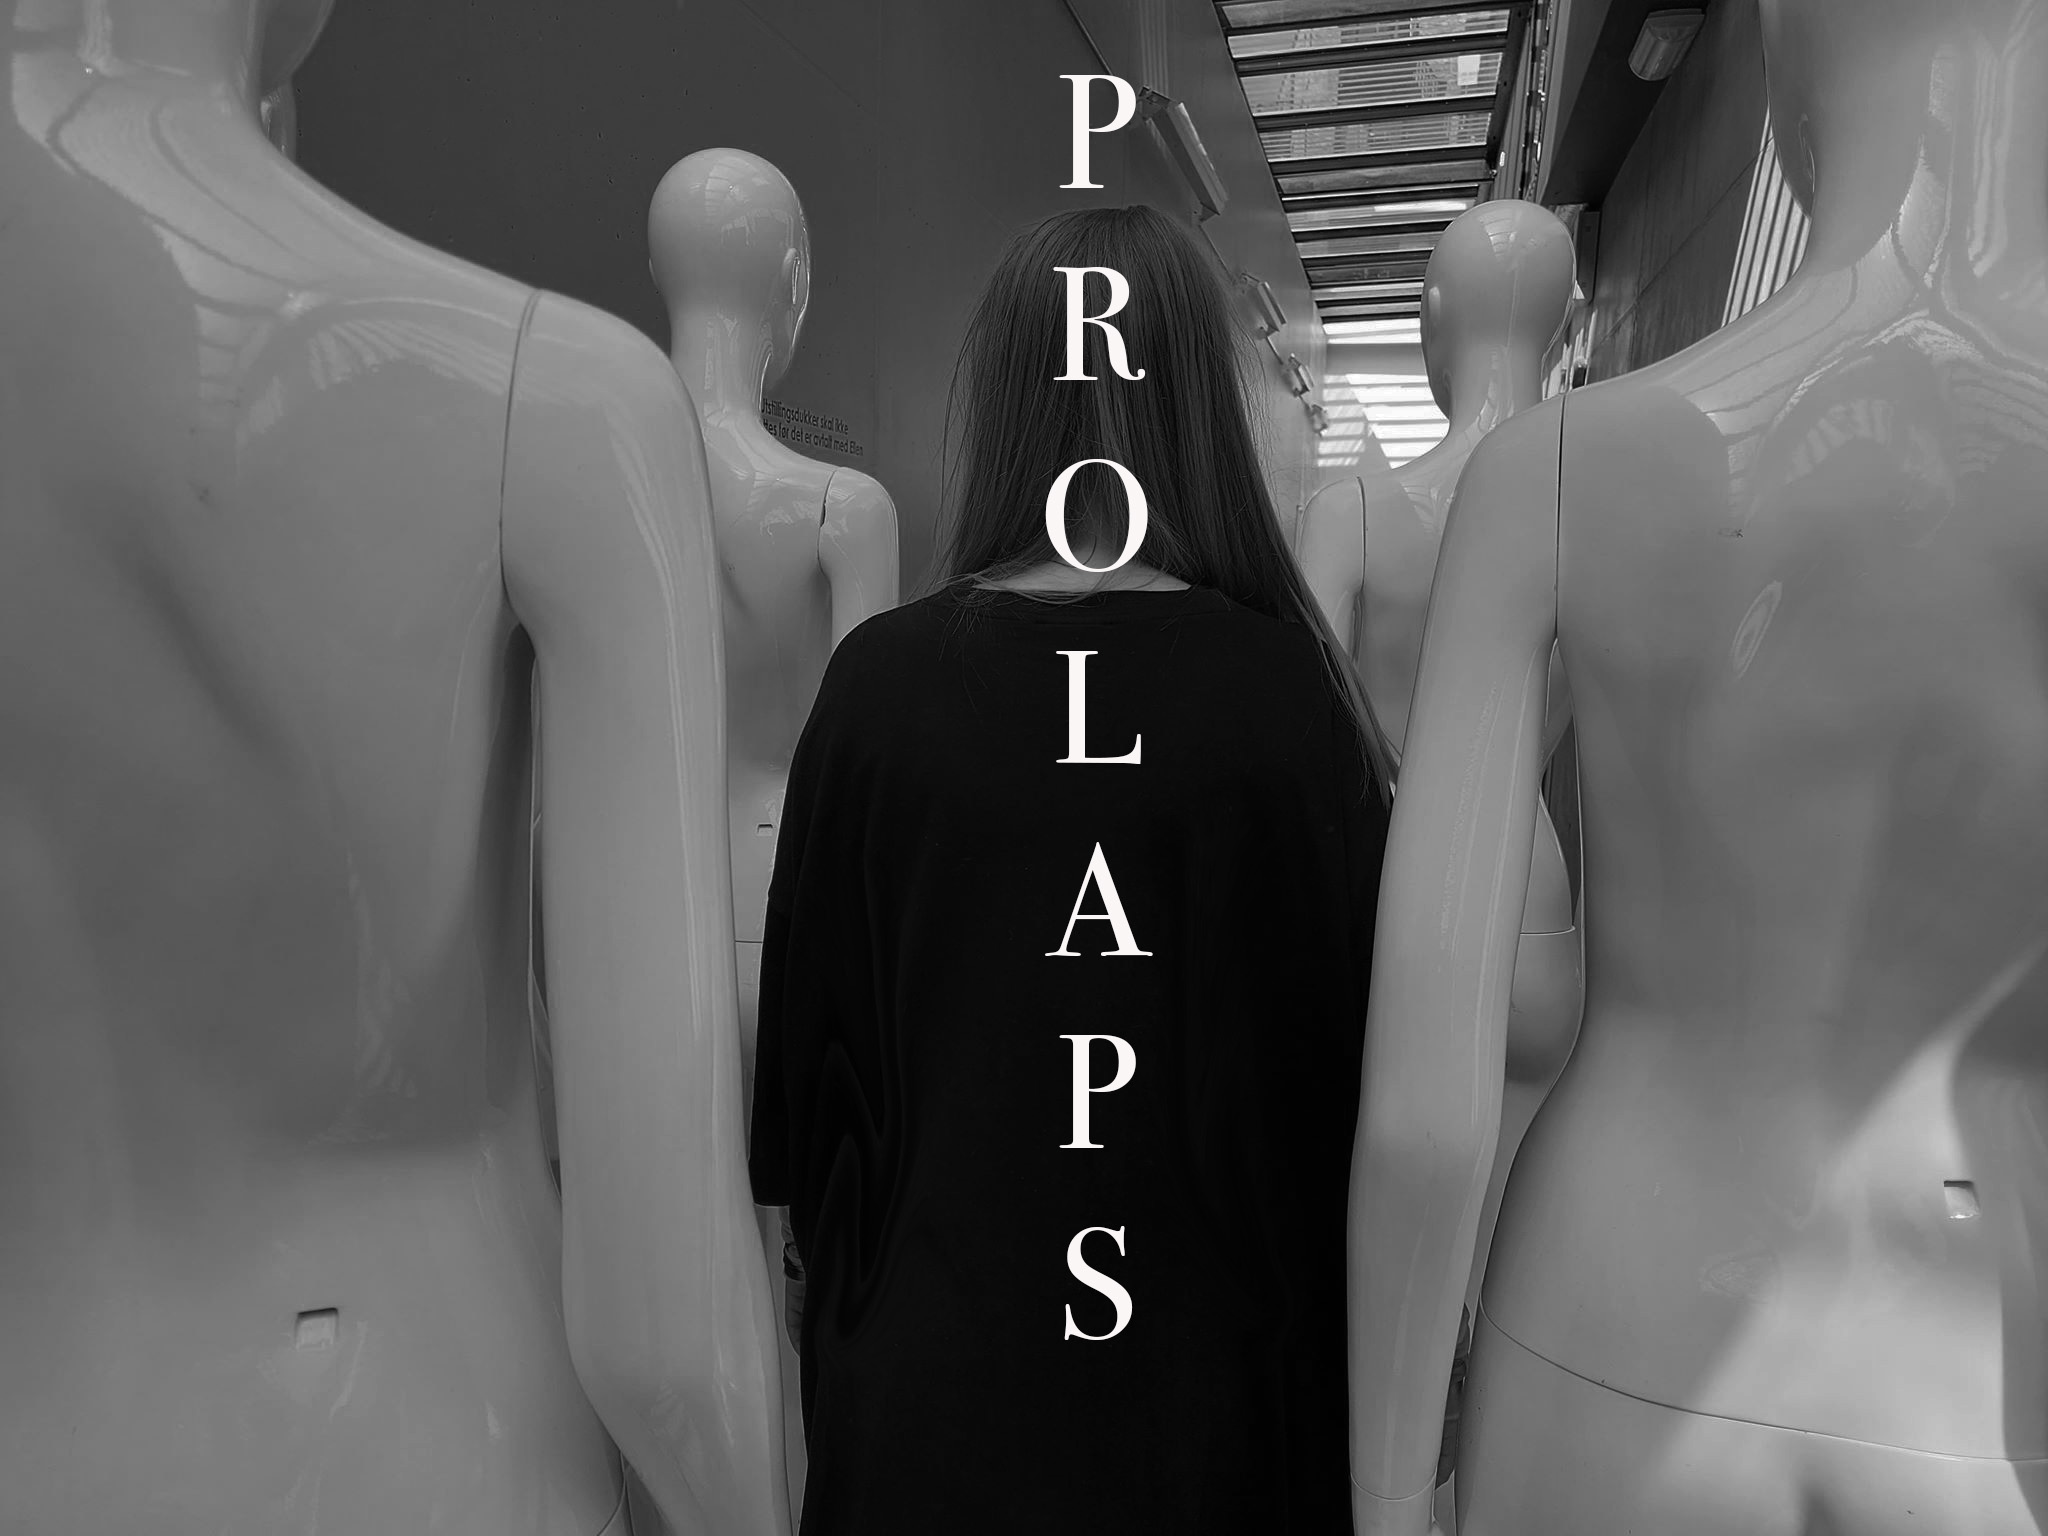 Westerdals Institutt for Film og Medier - PROLAPS